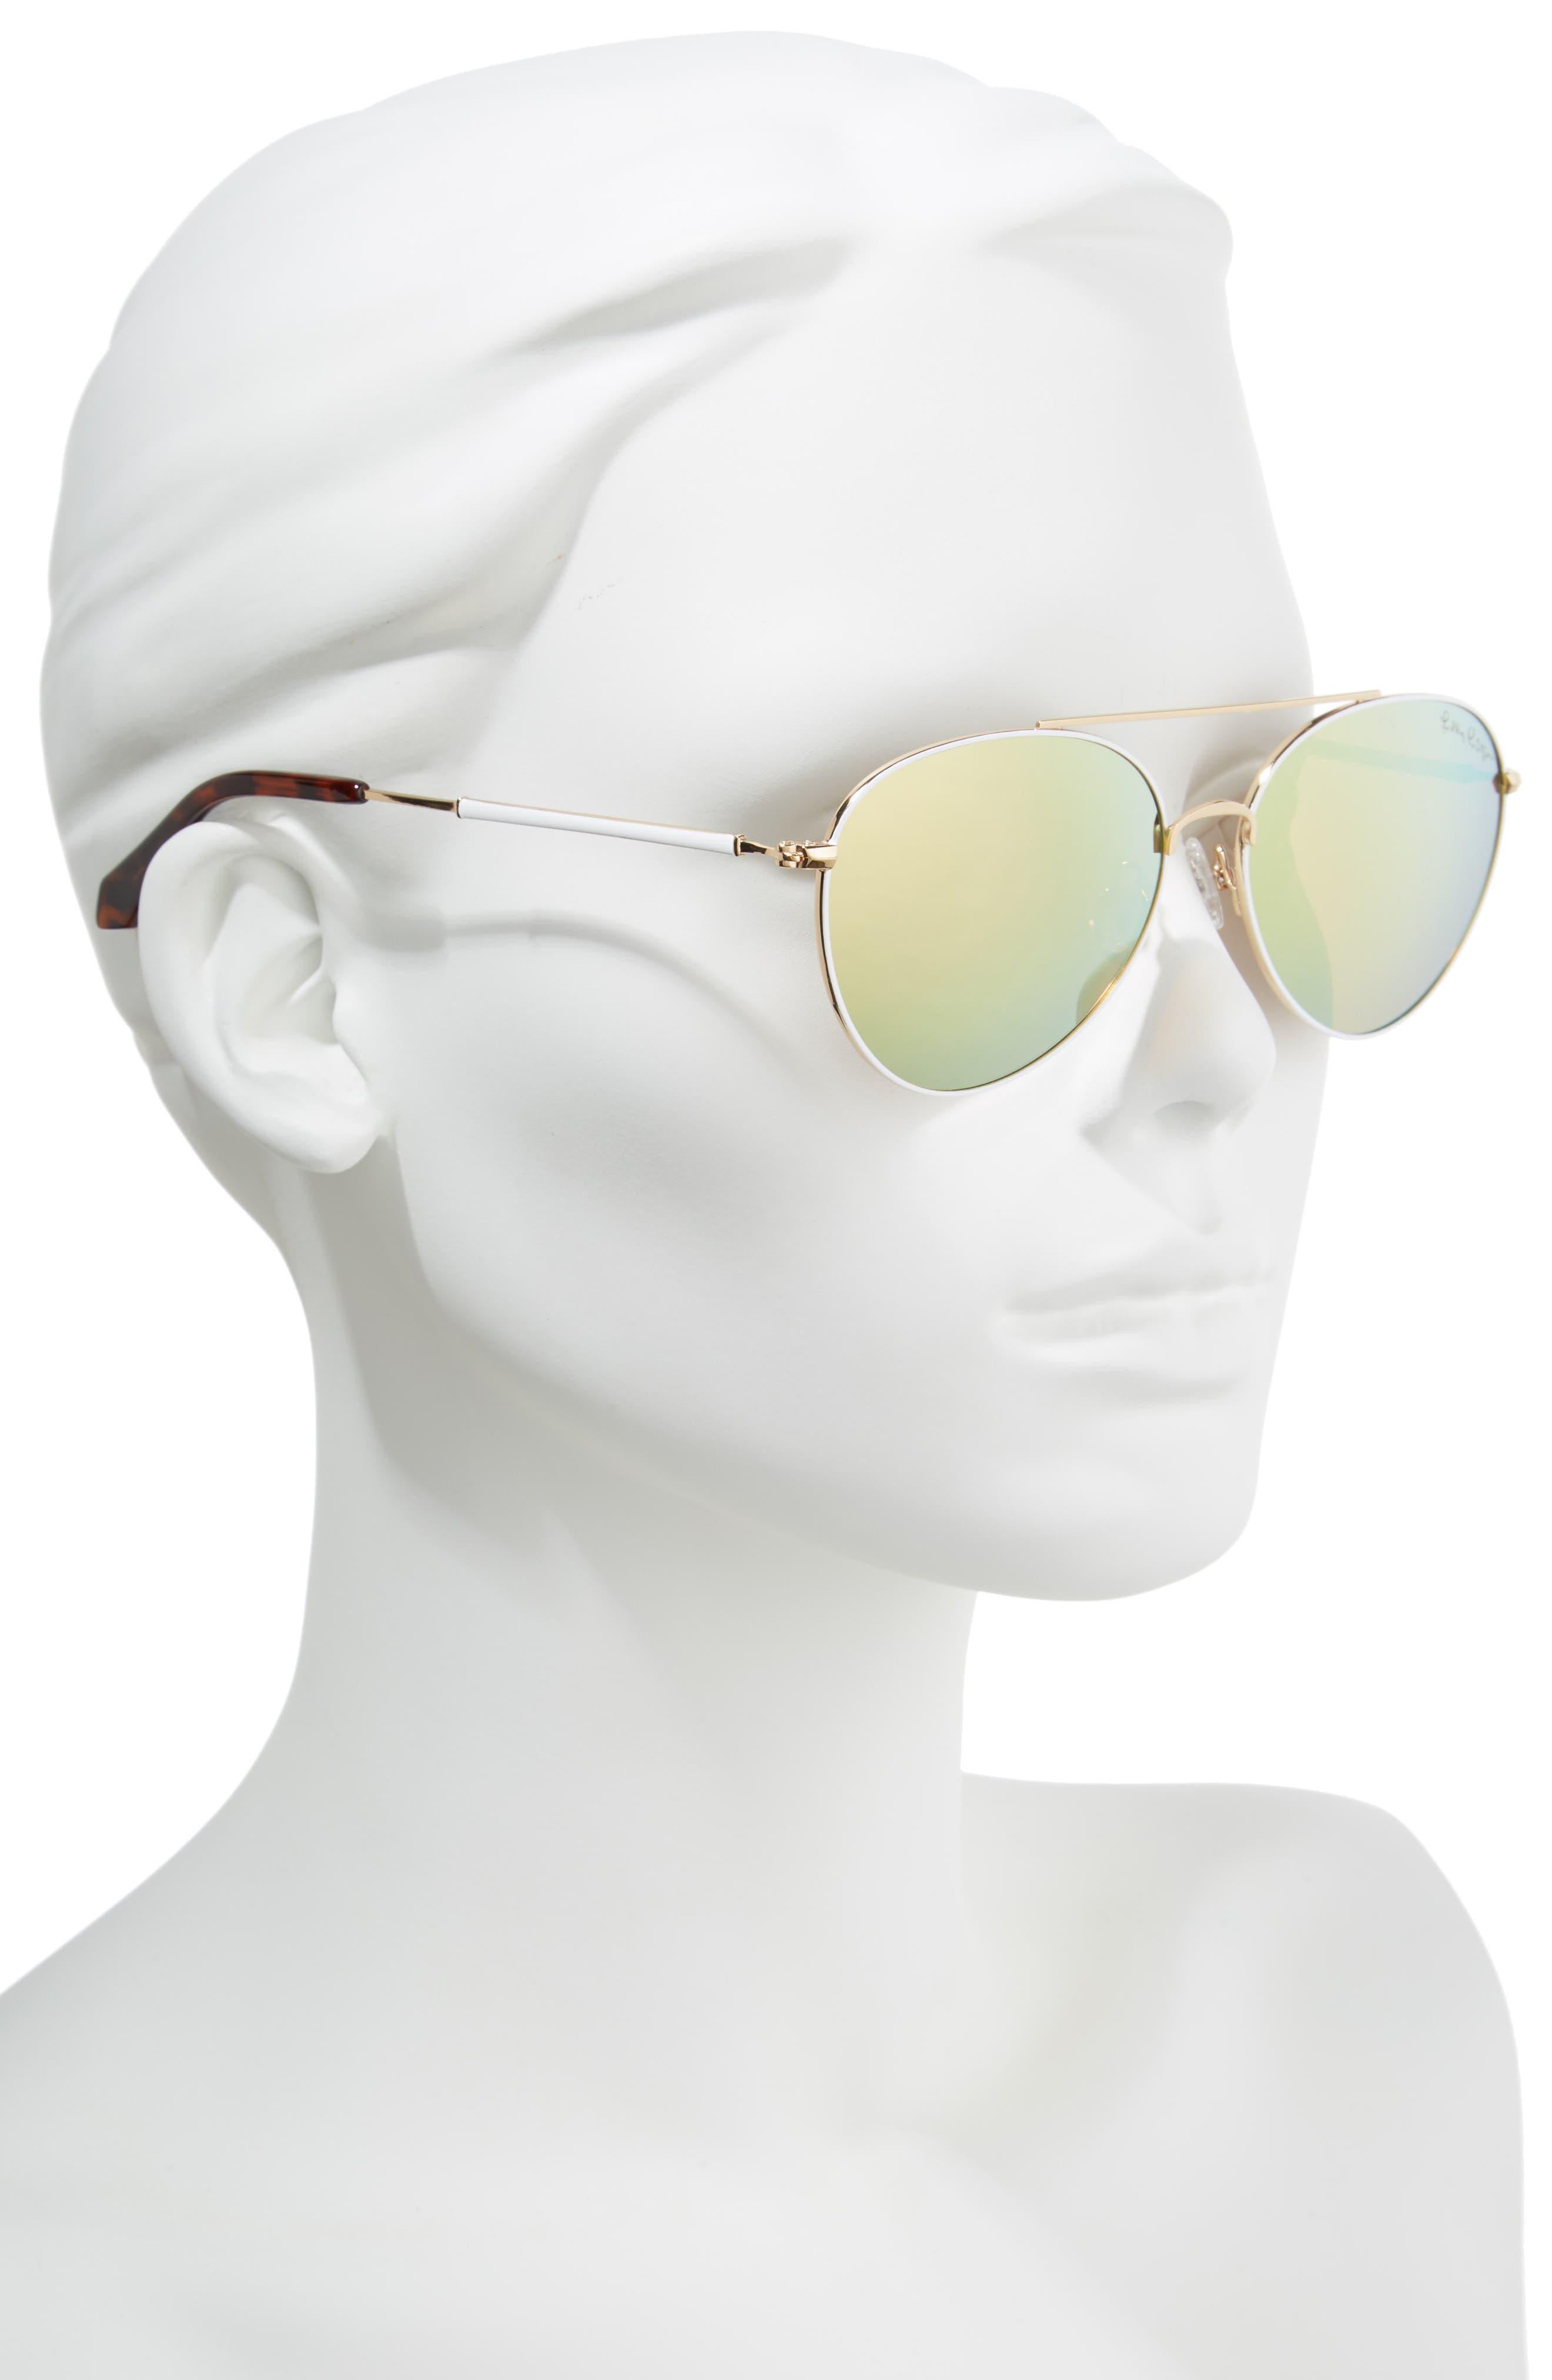 Isabelle 56mm Polarized Metal Aviator Sunglasses,                             Alternate thumbnail 2, color,                             GOLD/ GOLD